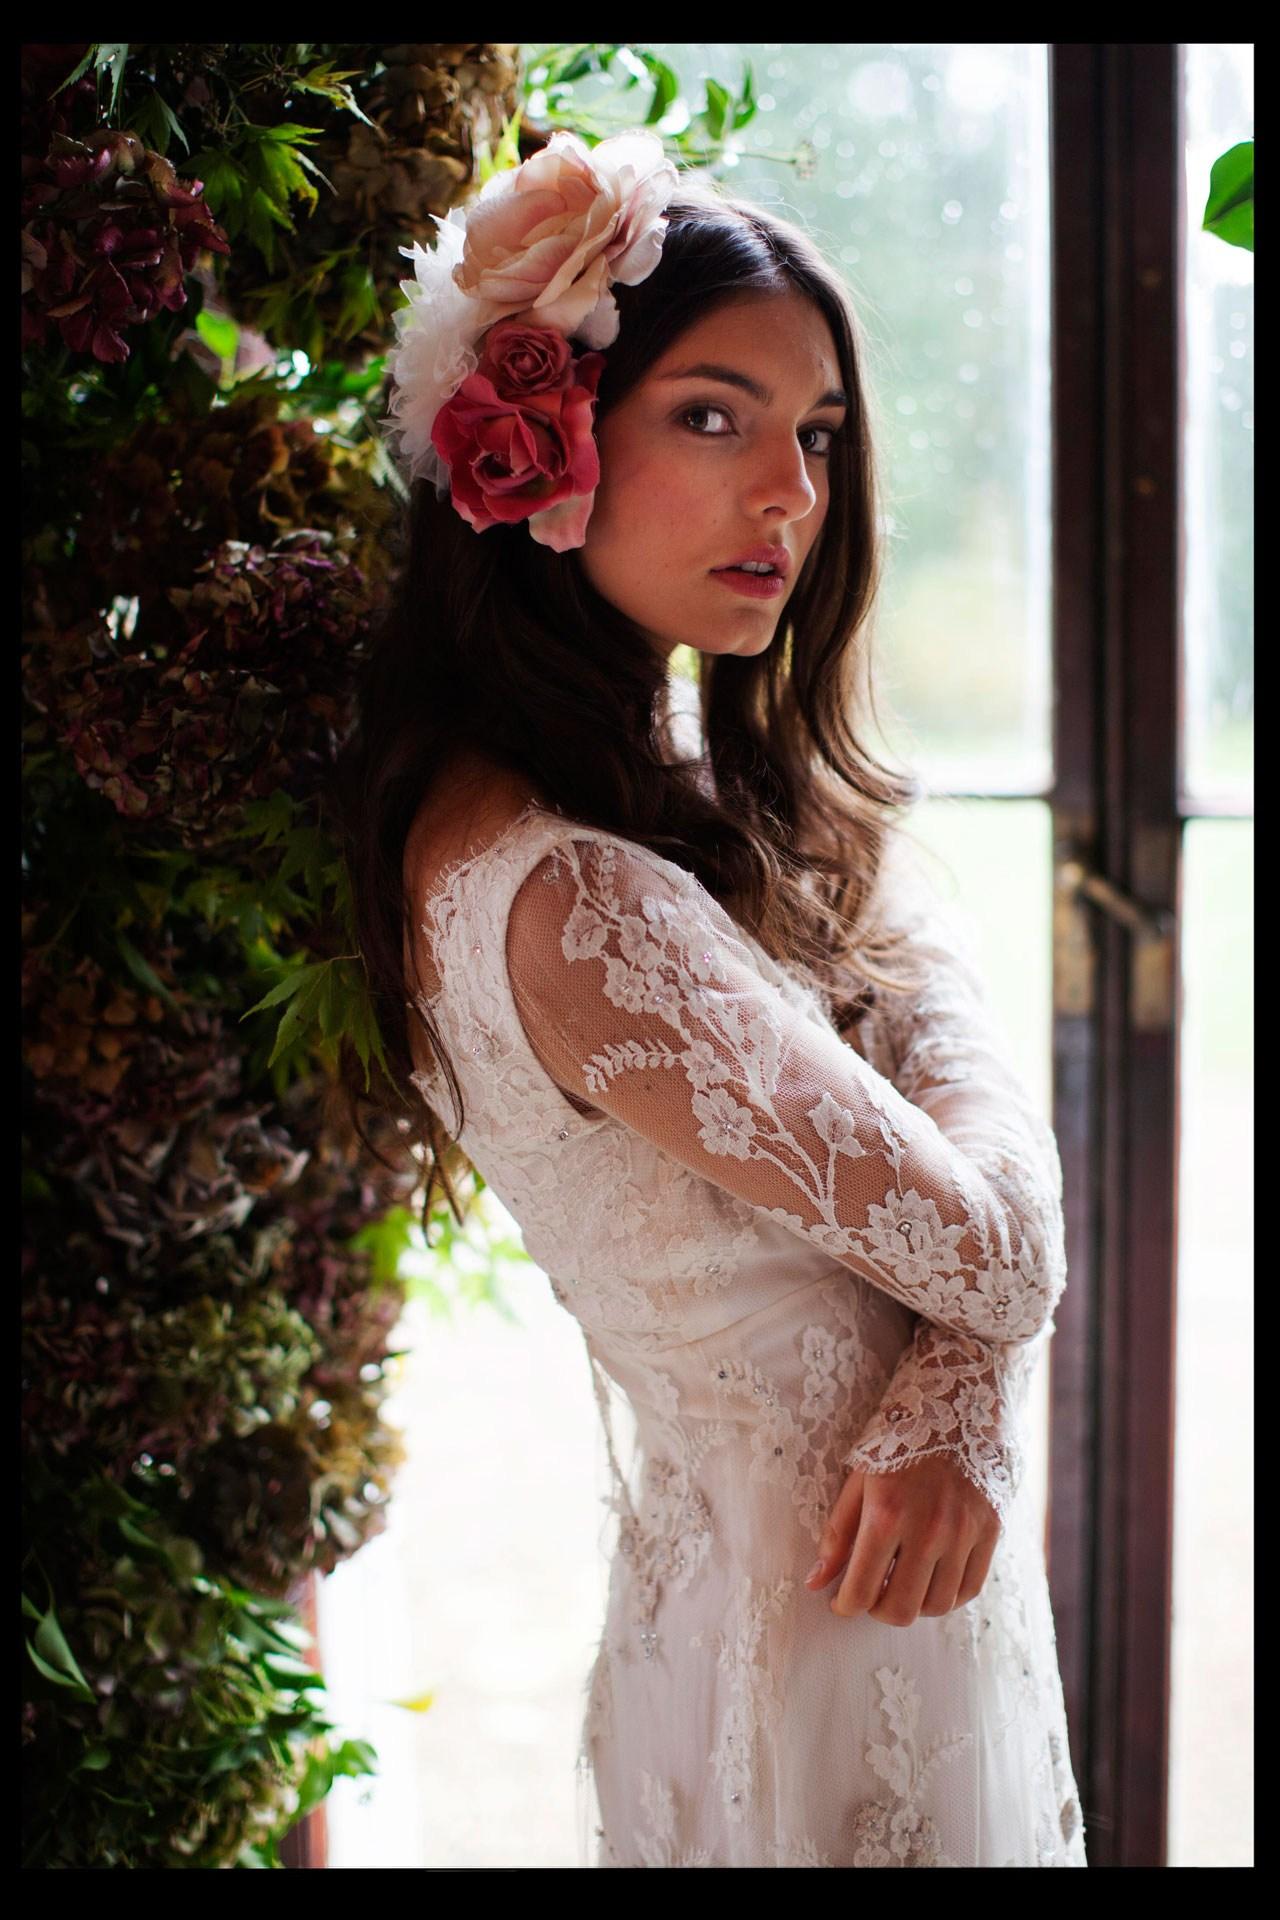 Shot1B-pennard-house-brides-9jan14_EmmaLewis_b.jpg